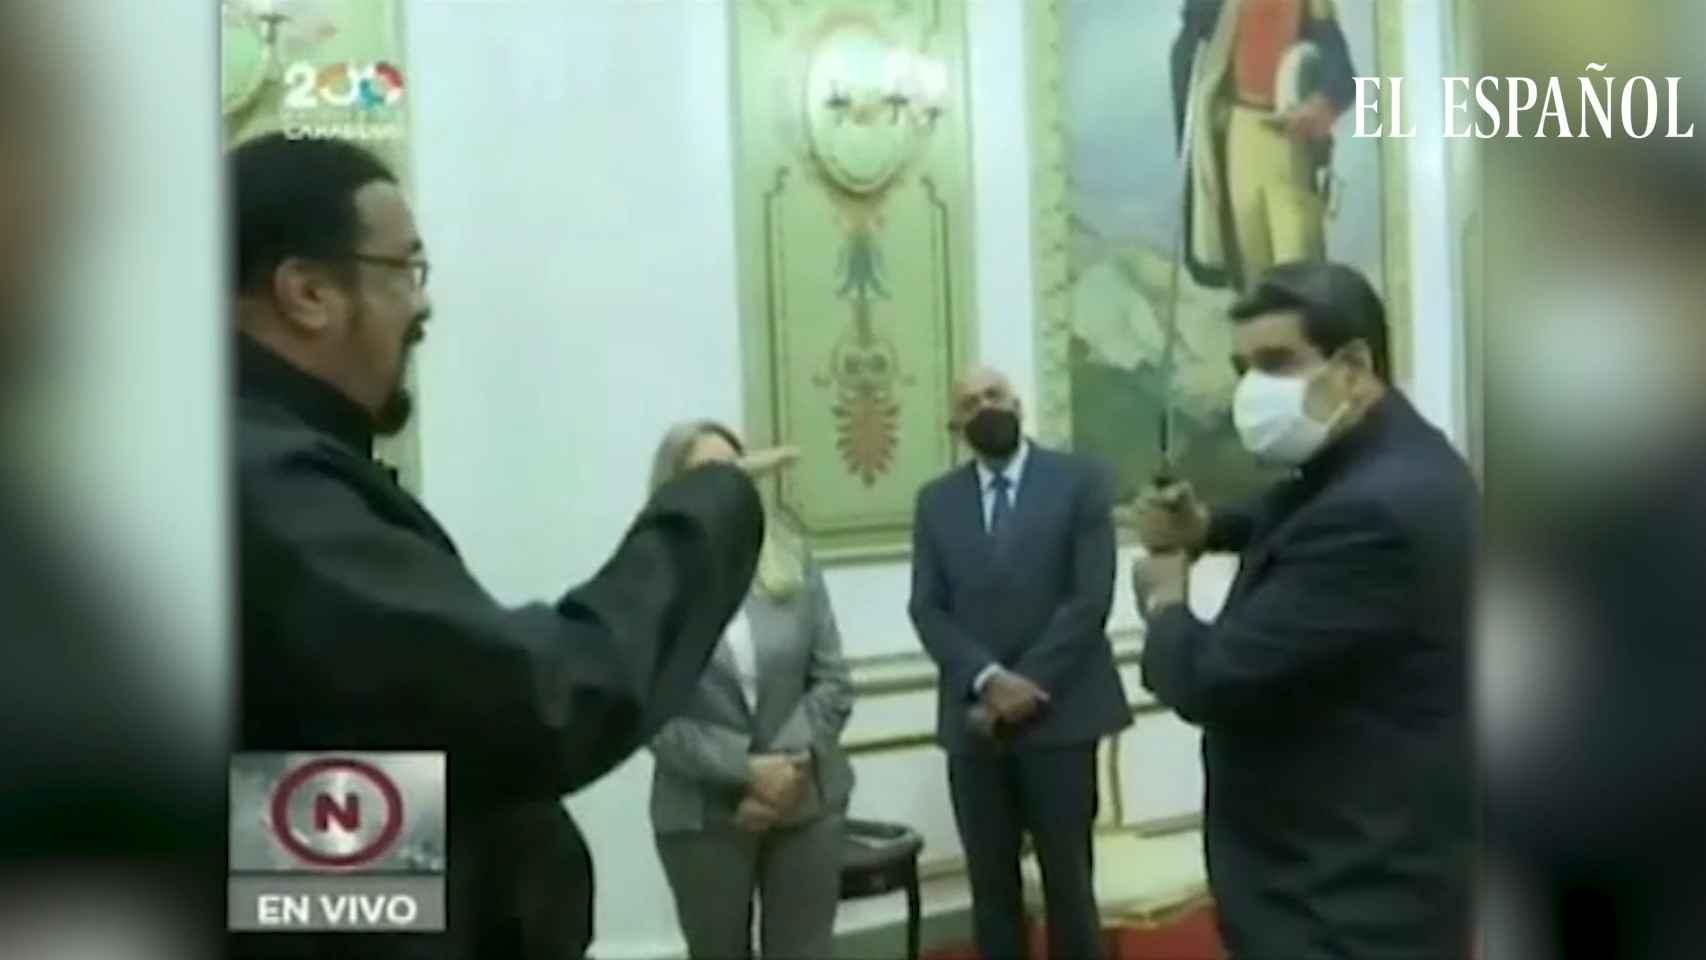 Steven Seagal visita a Nicolás Maduro en Venezuela como representante de Rusia